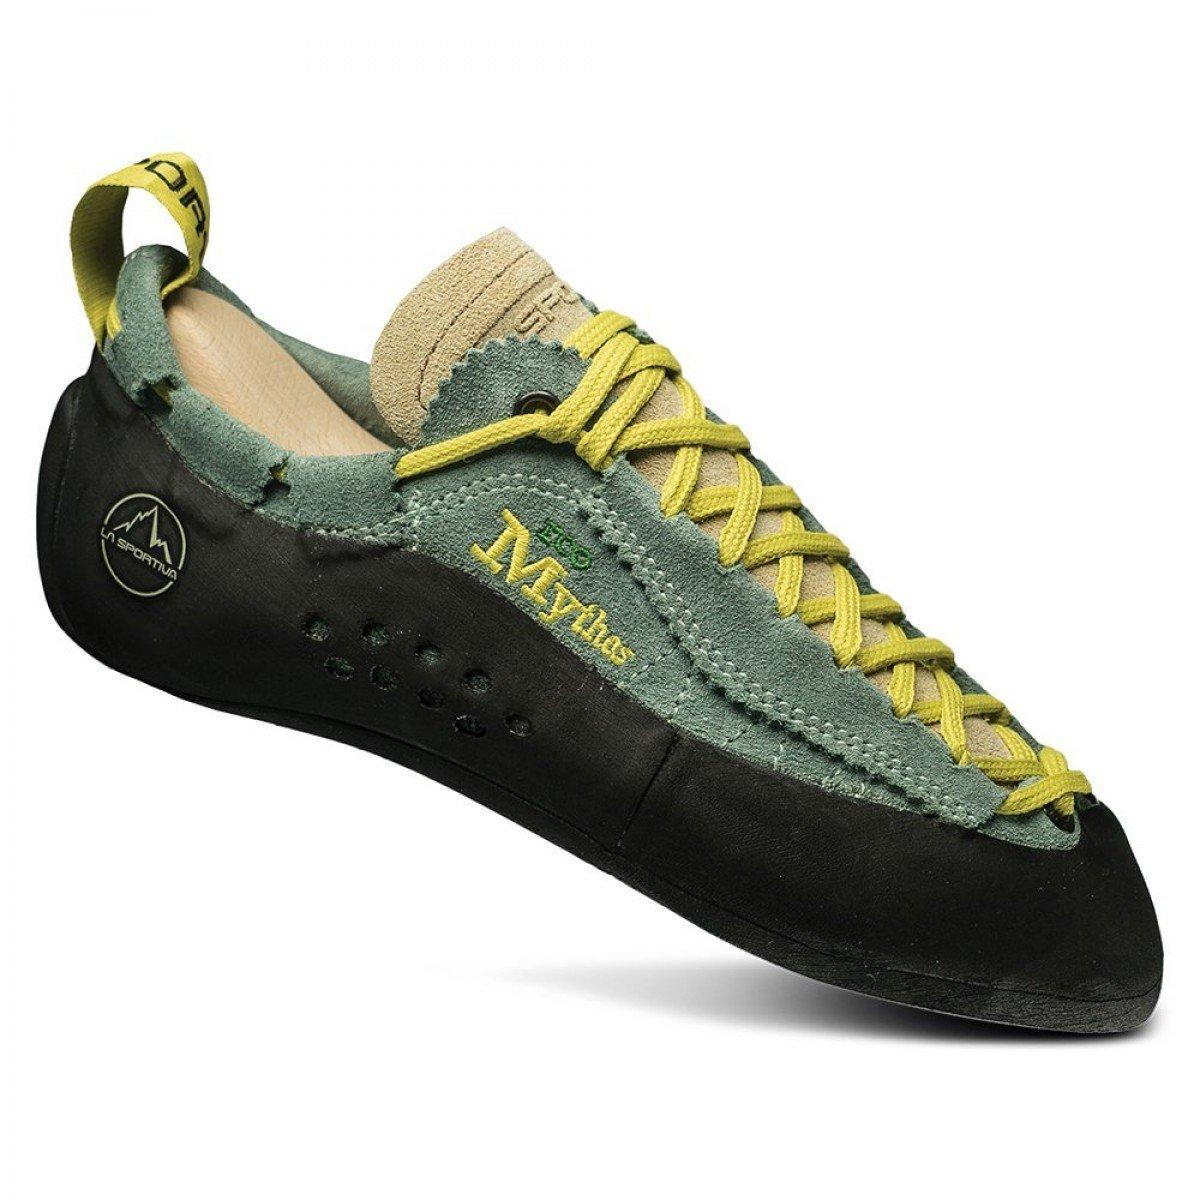 La Sportiva Mythos Eco Women's Climbing Shoes